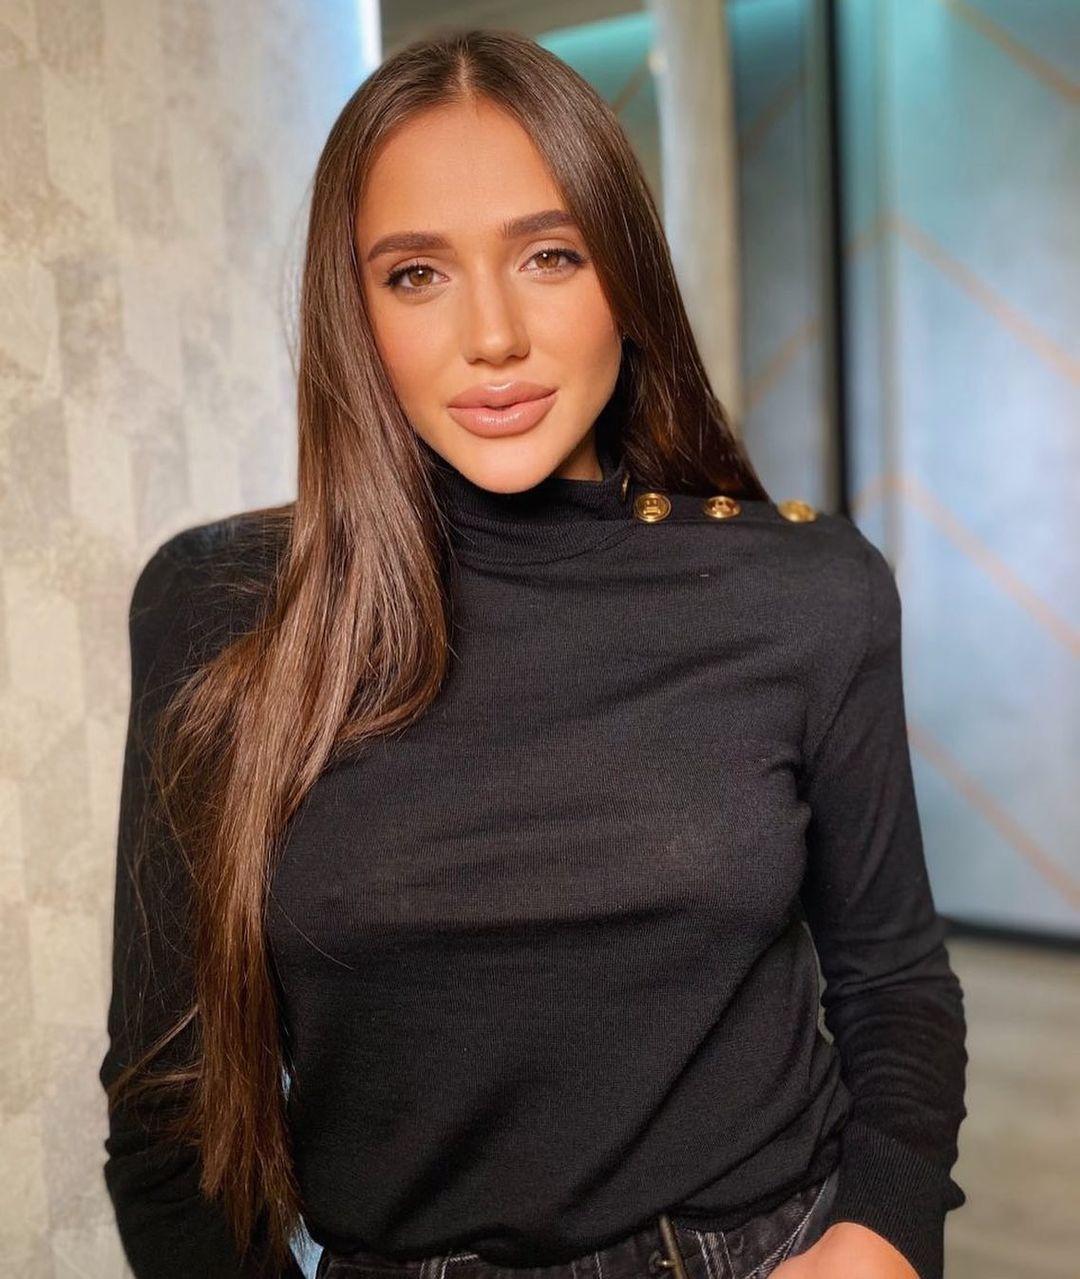 Даша Ульянова поразила обнаженным фото